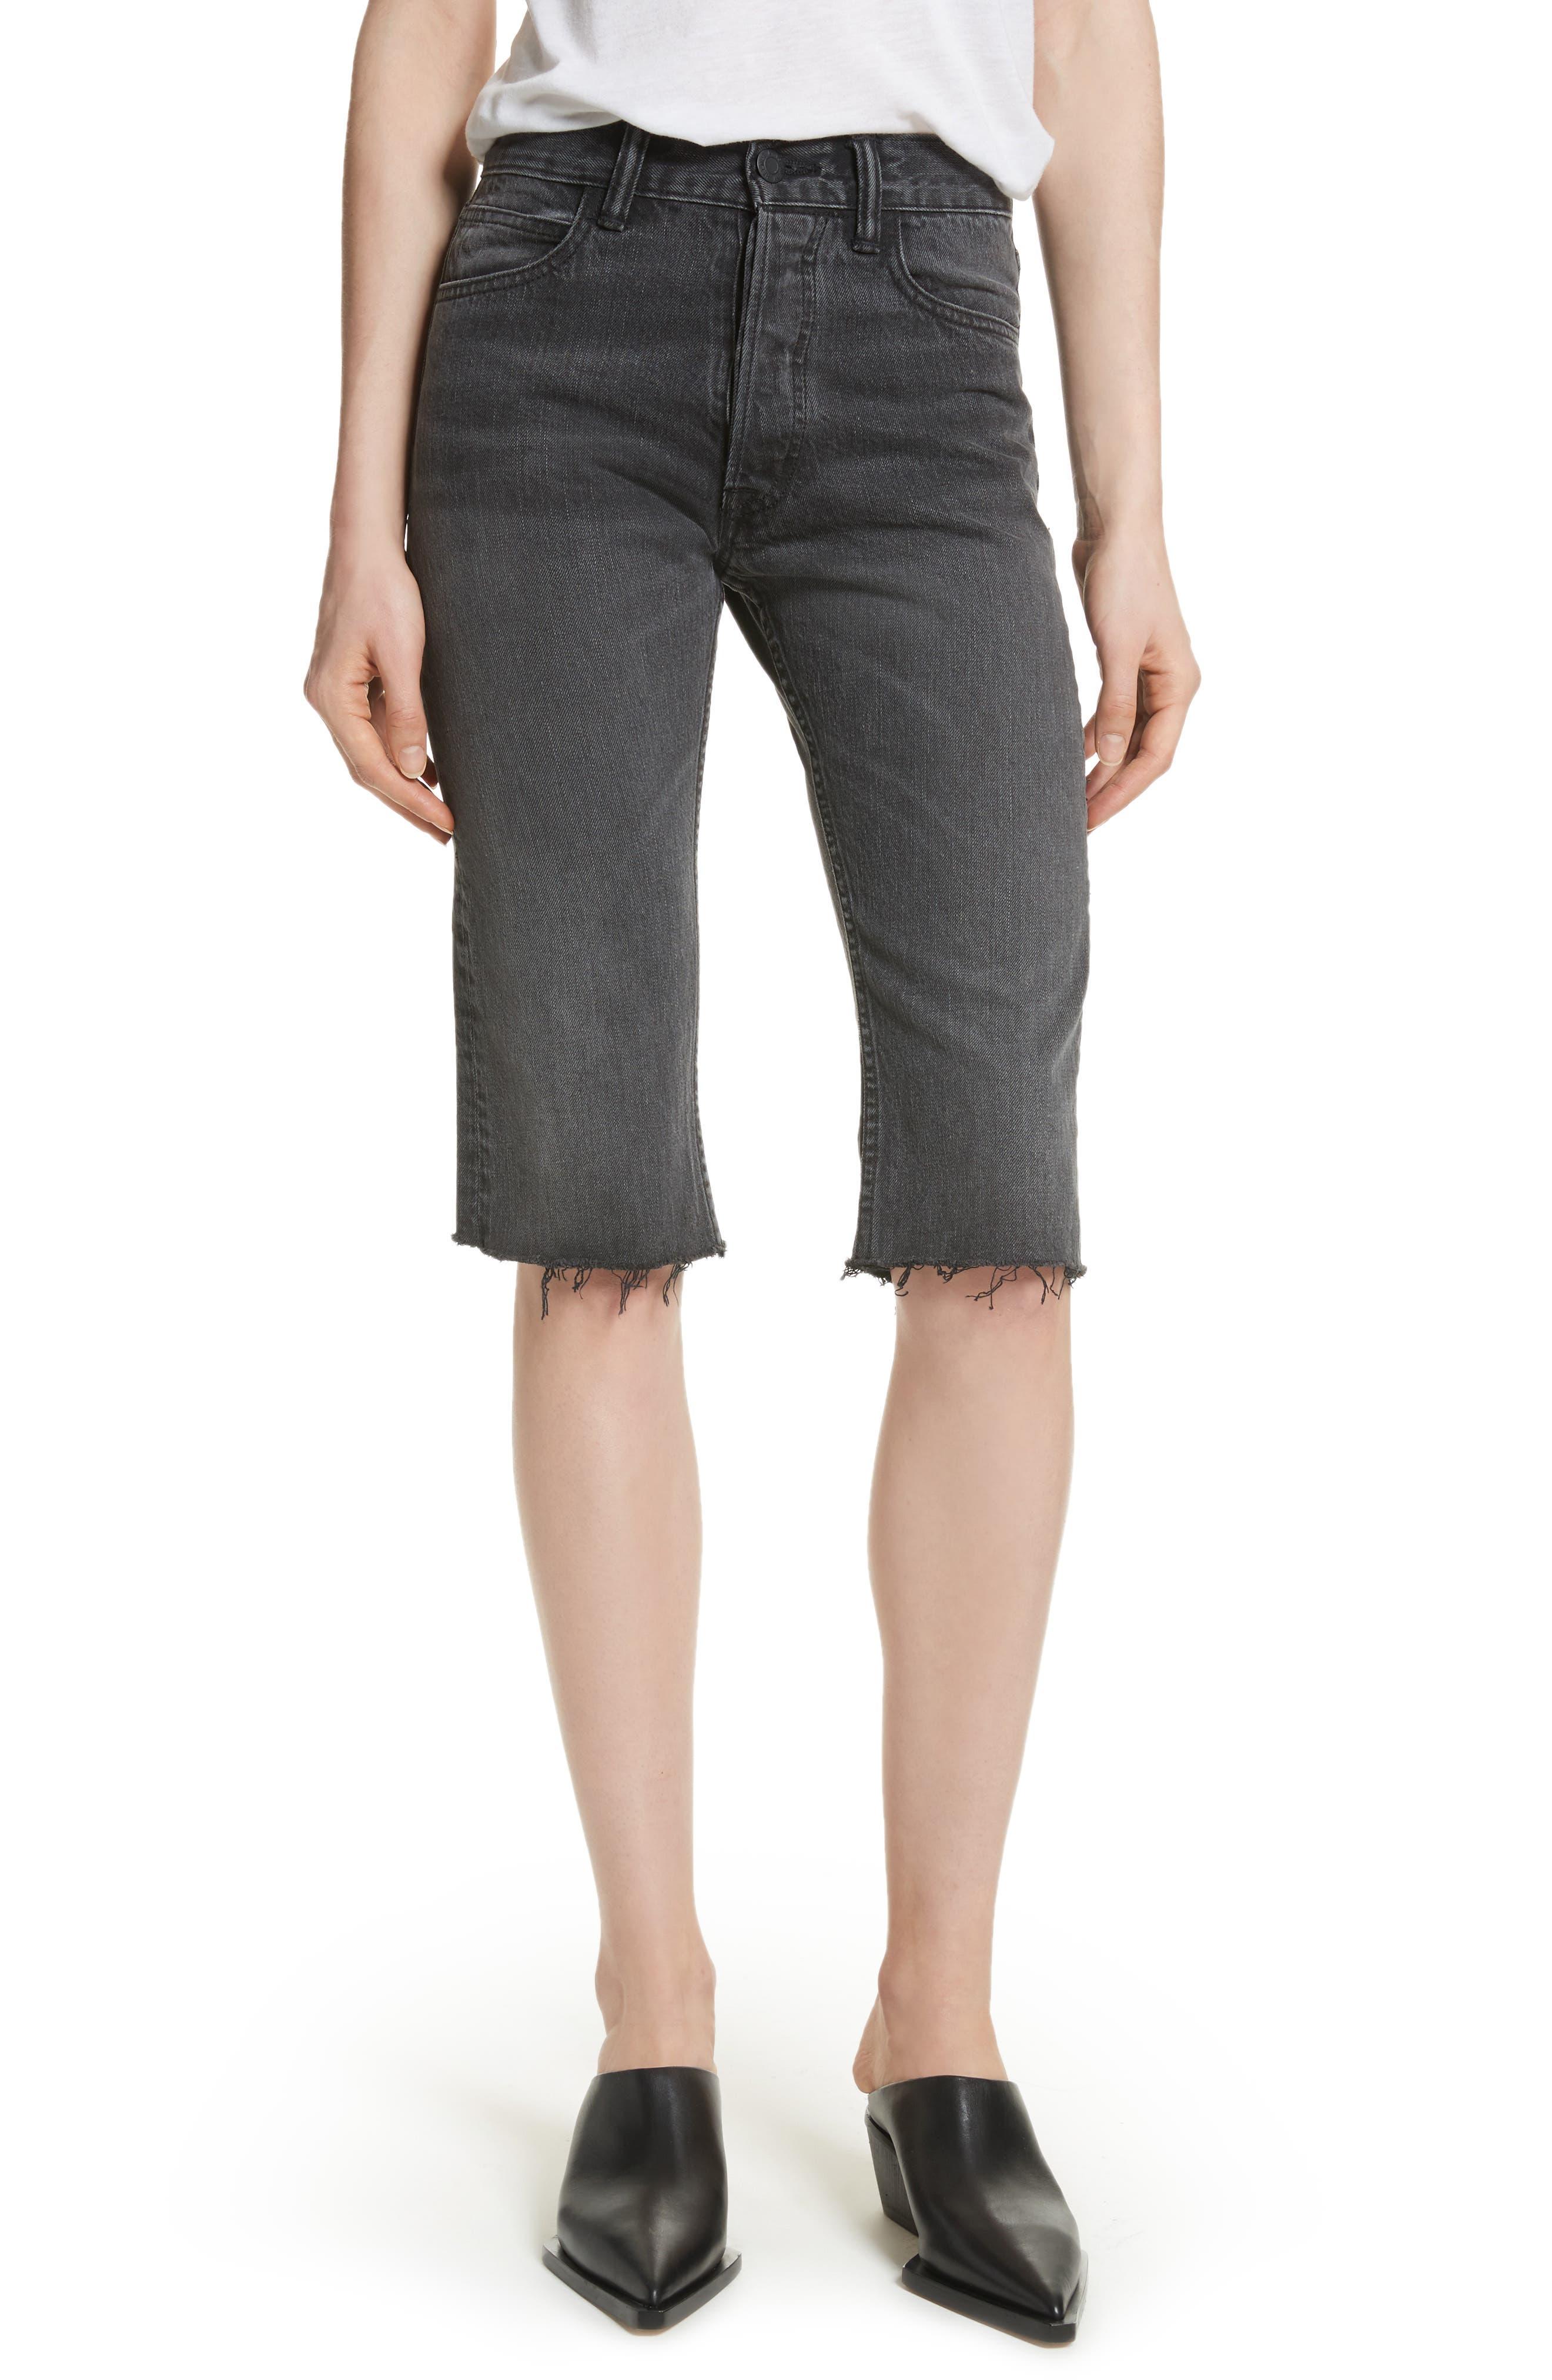 Cutoff Knee Length Denim Shorts,                             Main thumbnail 1, color,                             Rigid Black